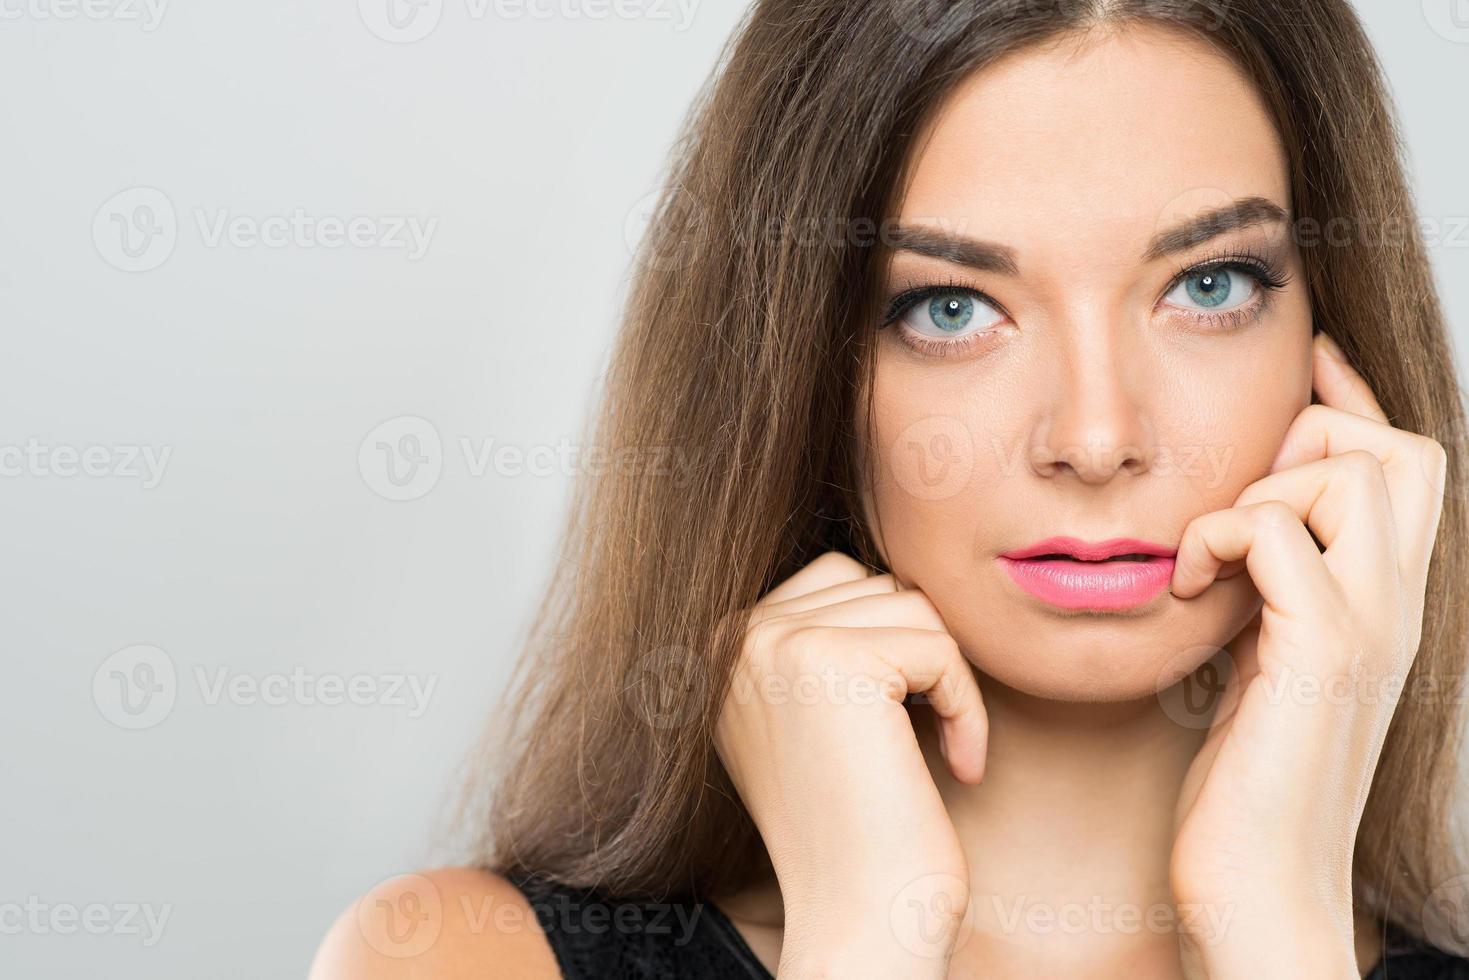 mujer atractiva foto